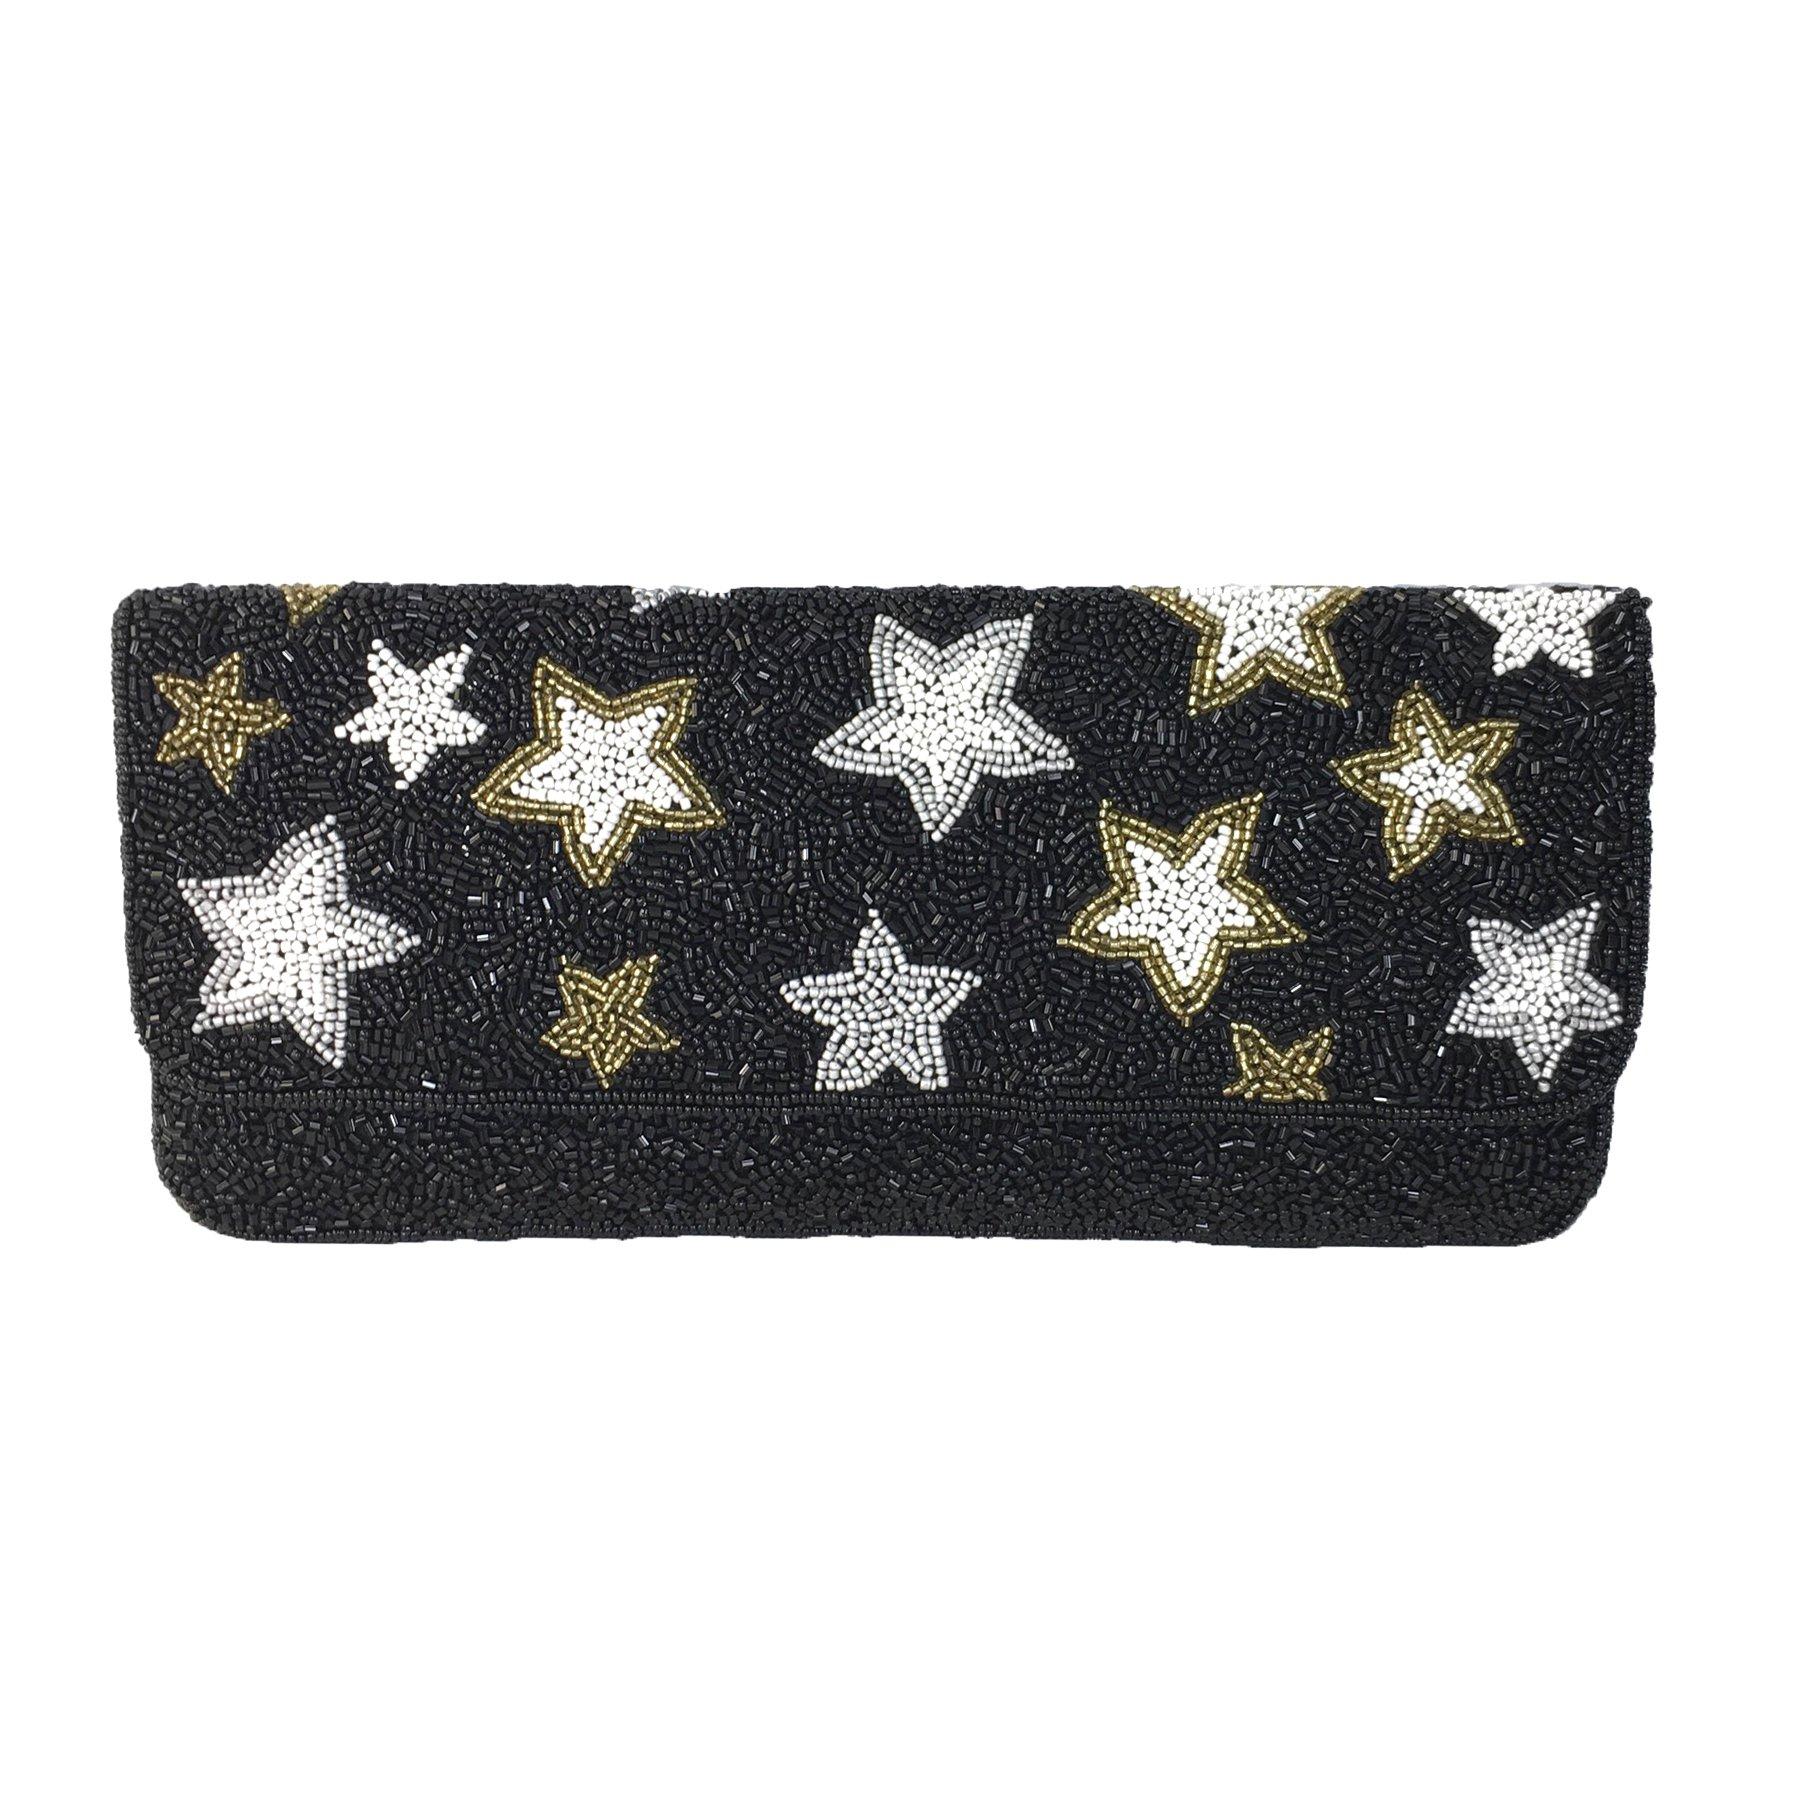 From St Xavier Starry Night Celestial Stars Beaded Clutch, Black Multi